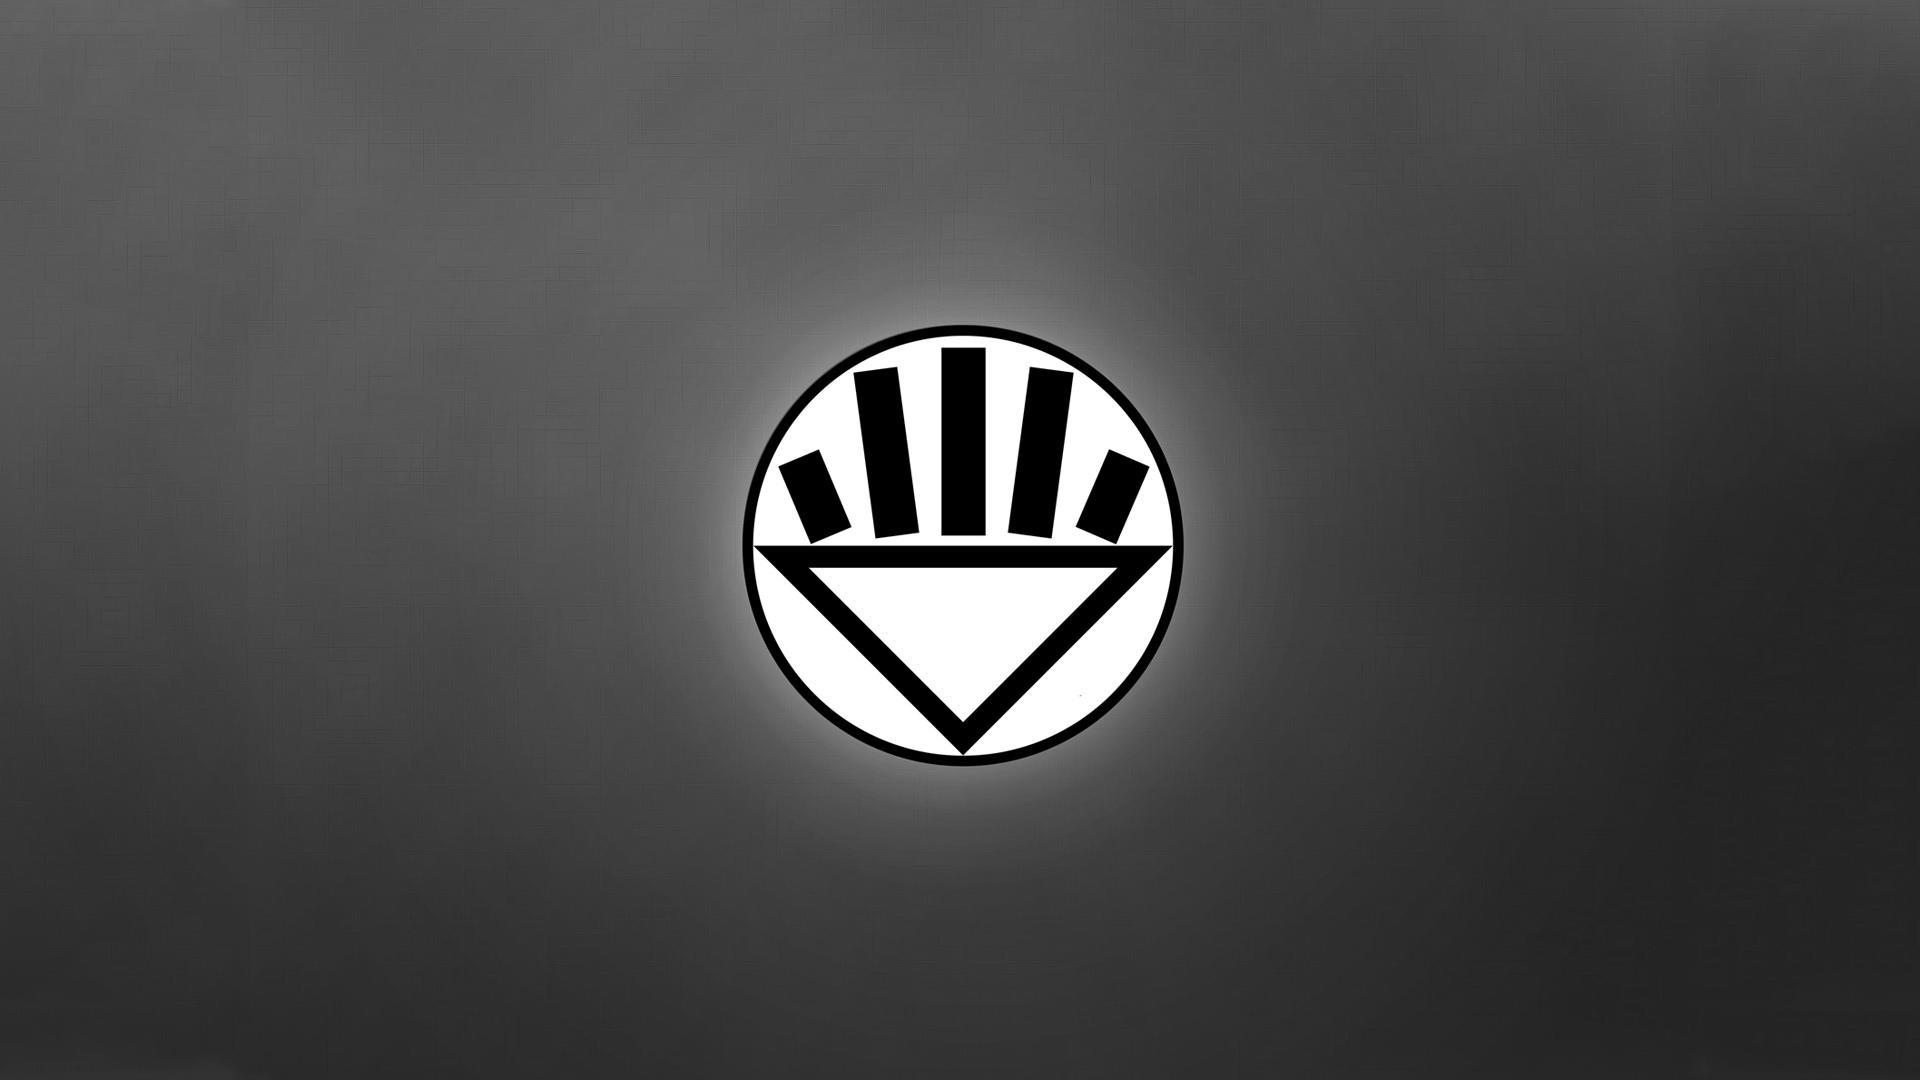 Black Lantern Corps wallpapers HD quality